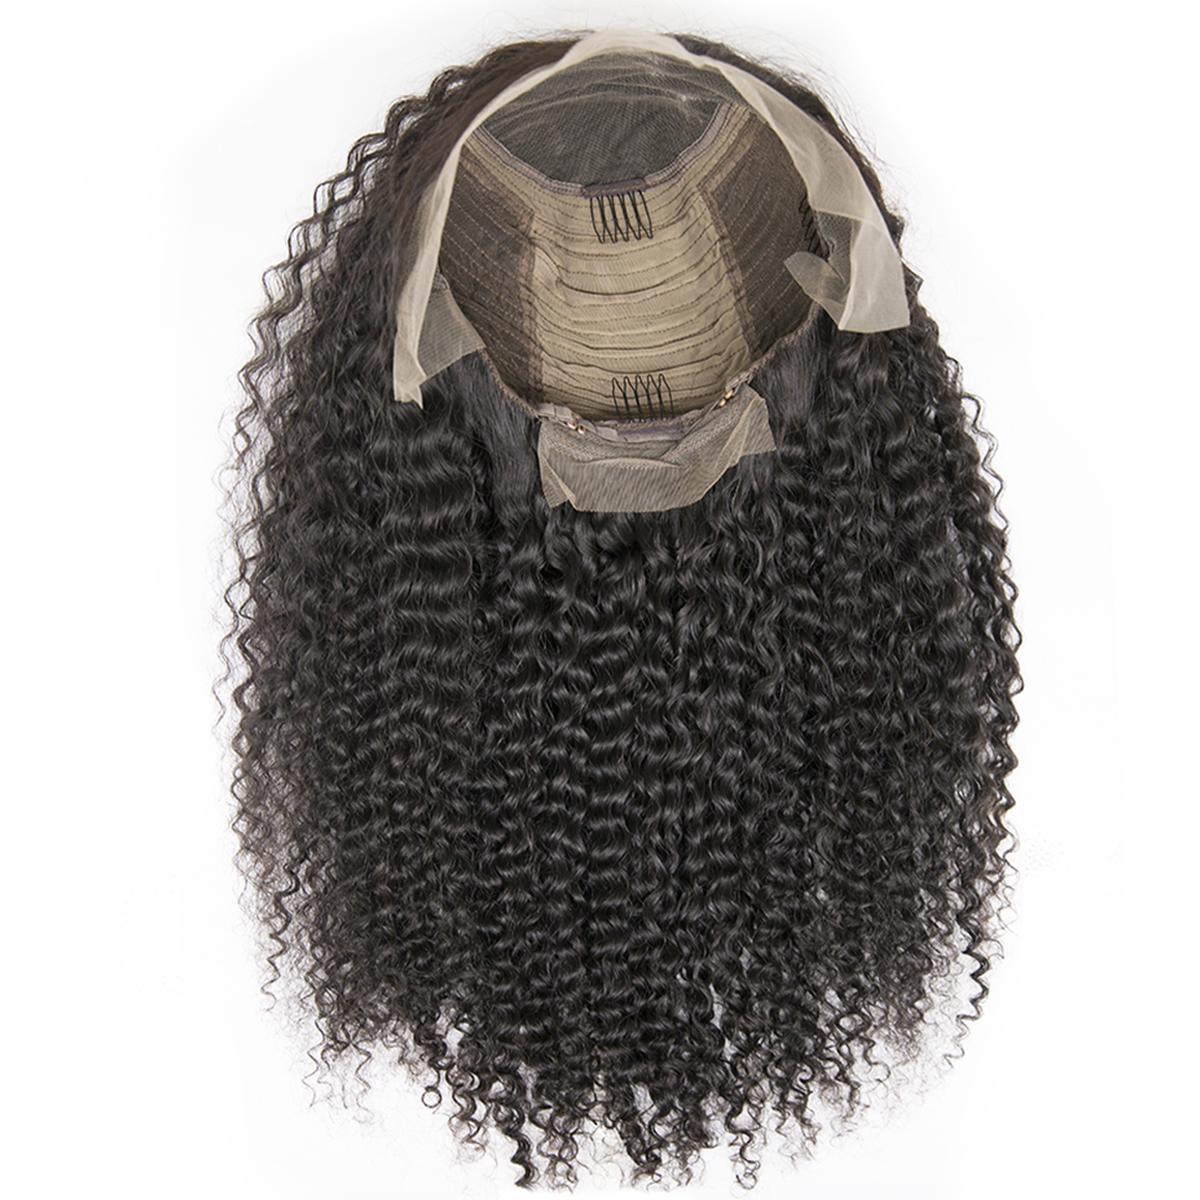 curly-bob-wig-1